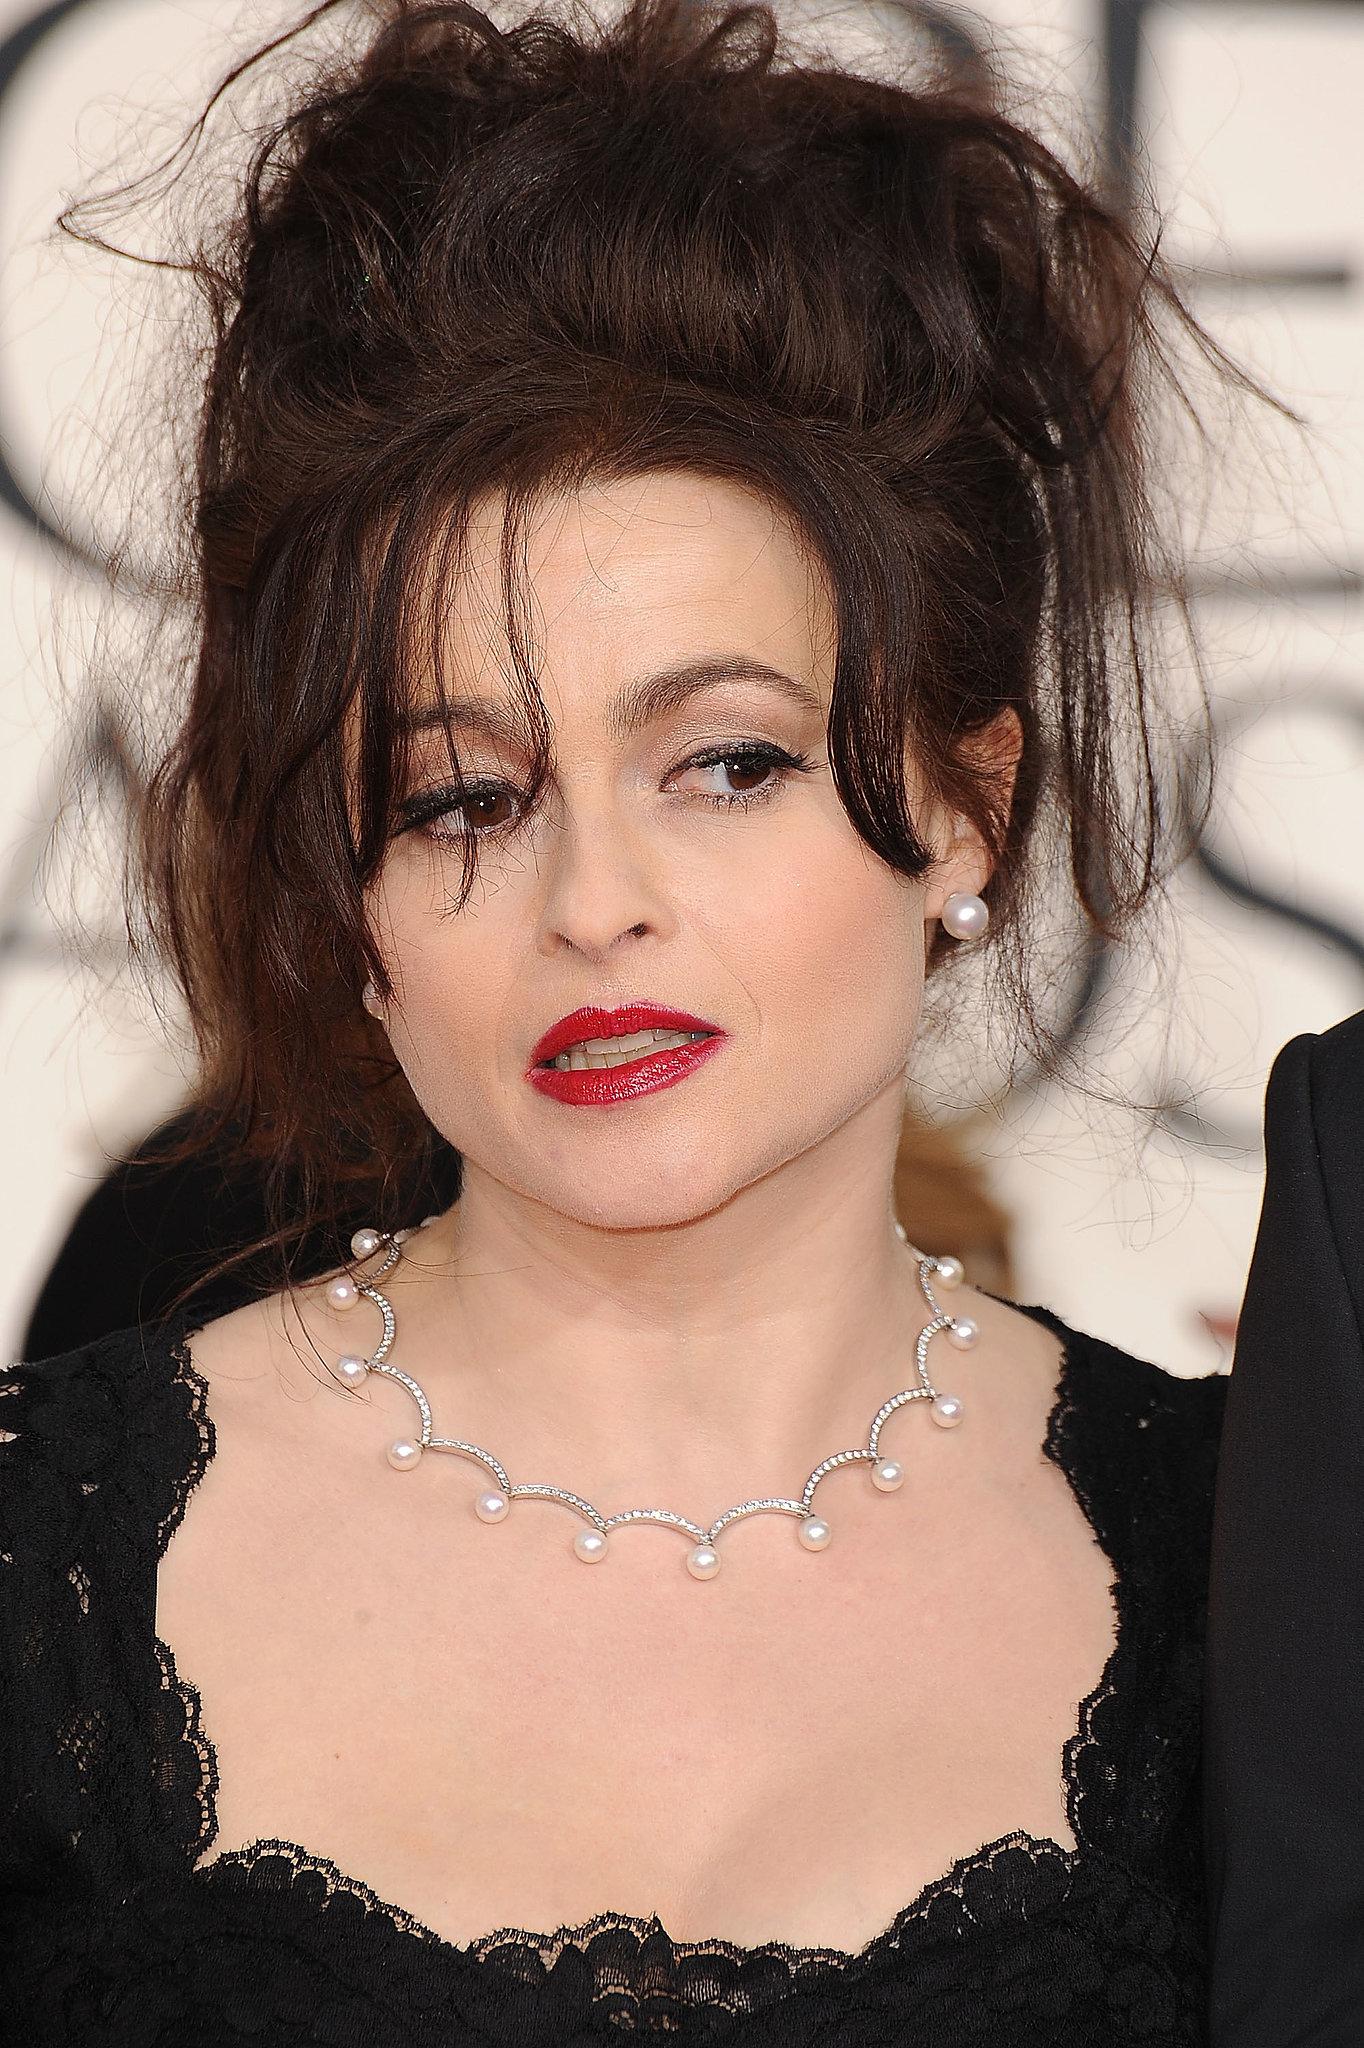 Helena Bonham Carter, ... Helena Bonham Carter